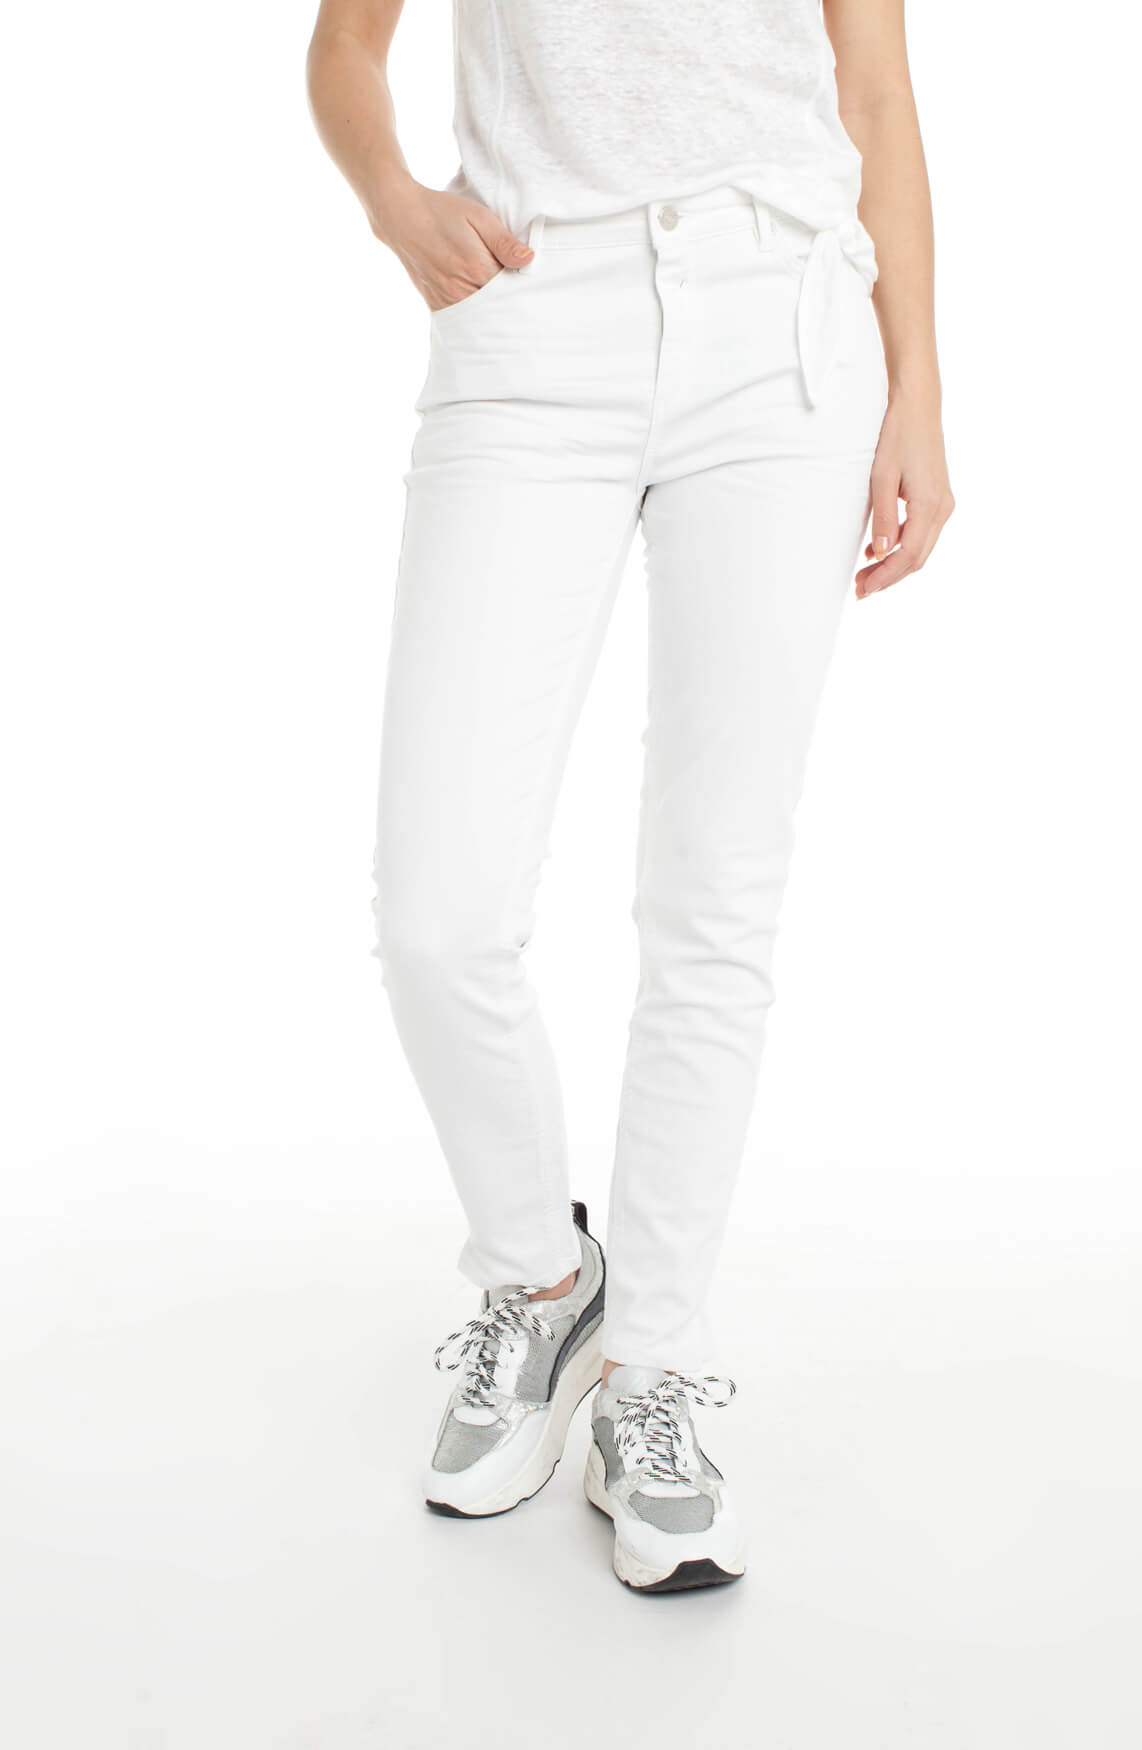 Rosner Dames Antonia jeans wit